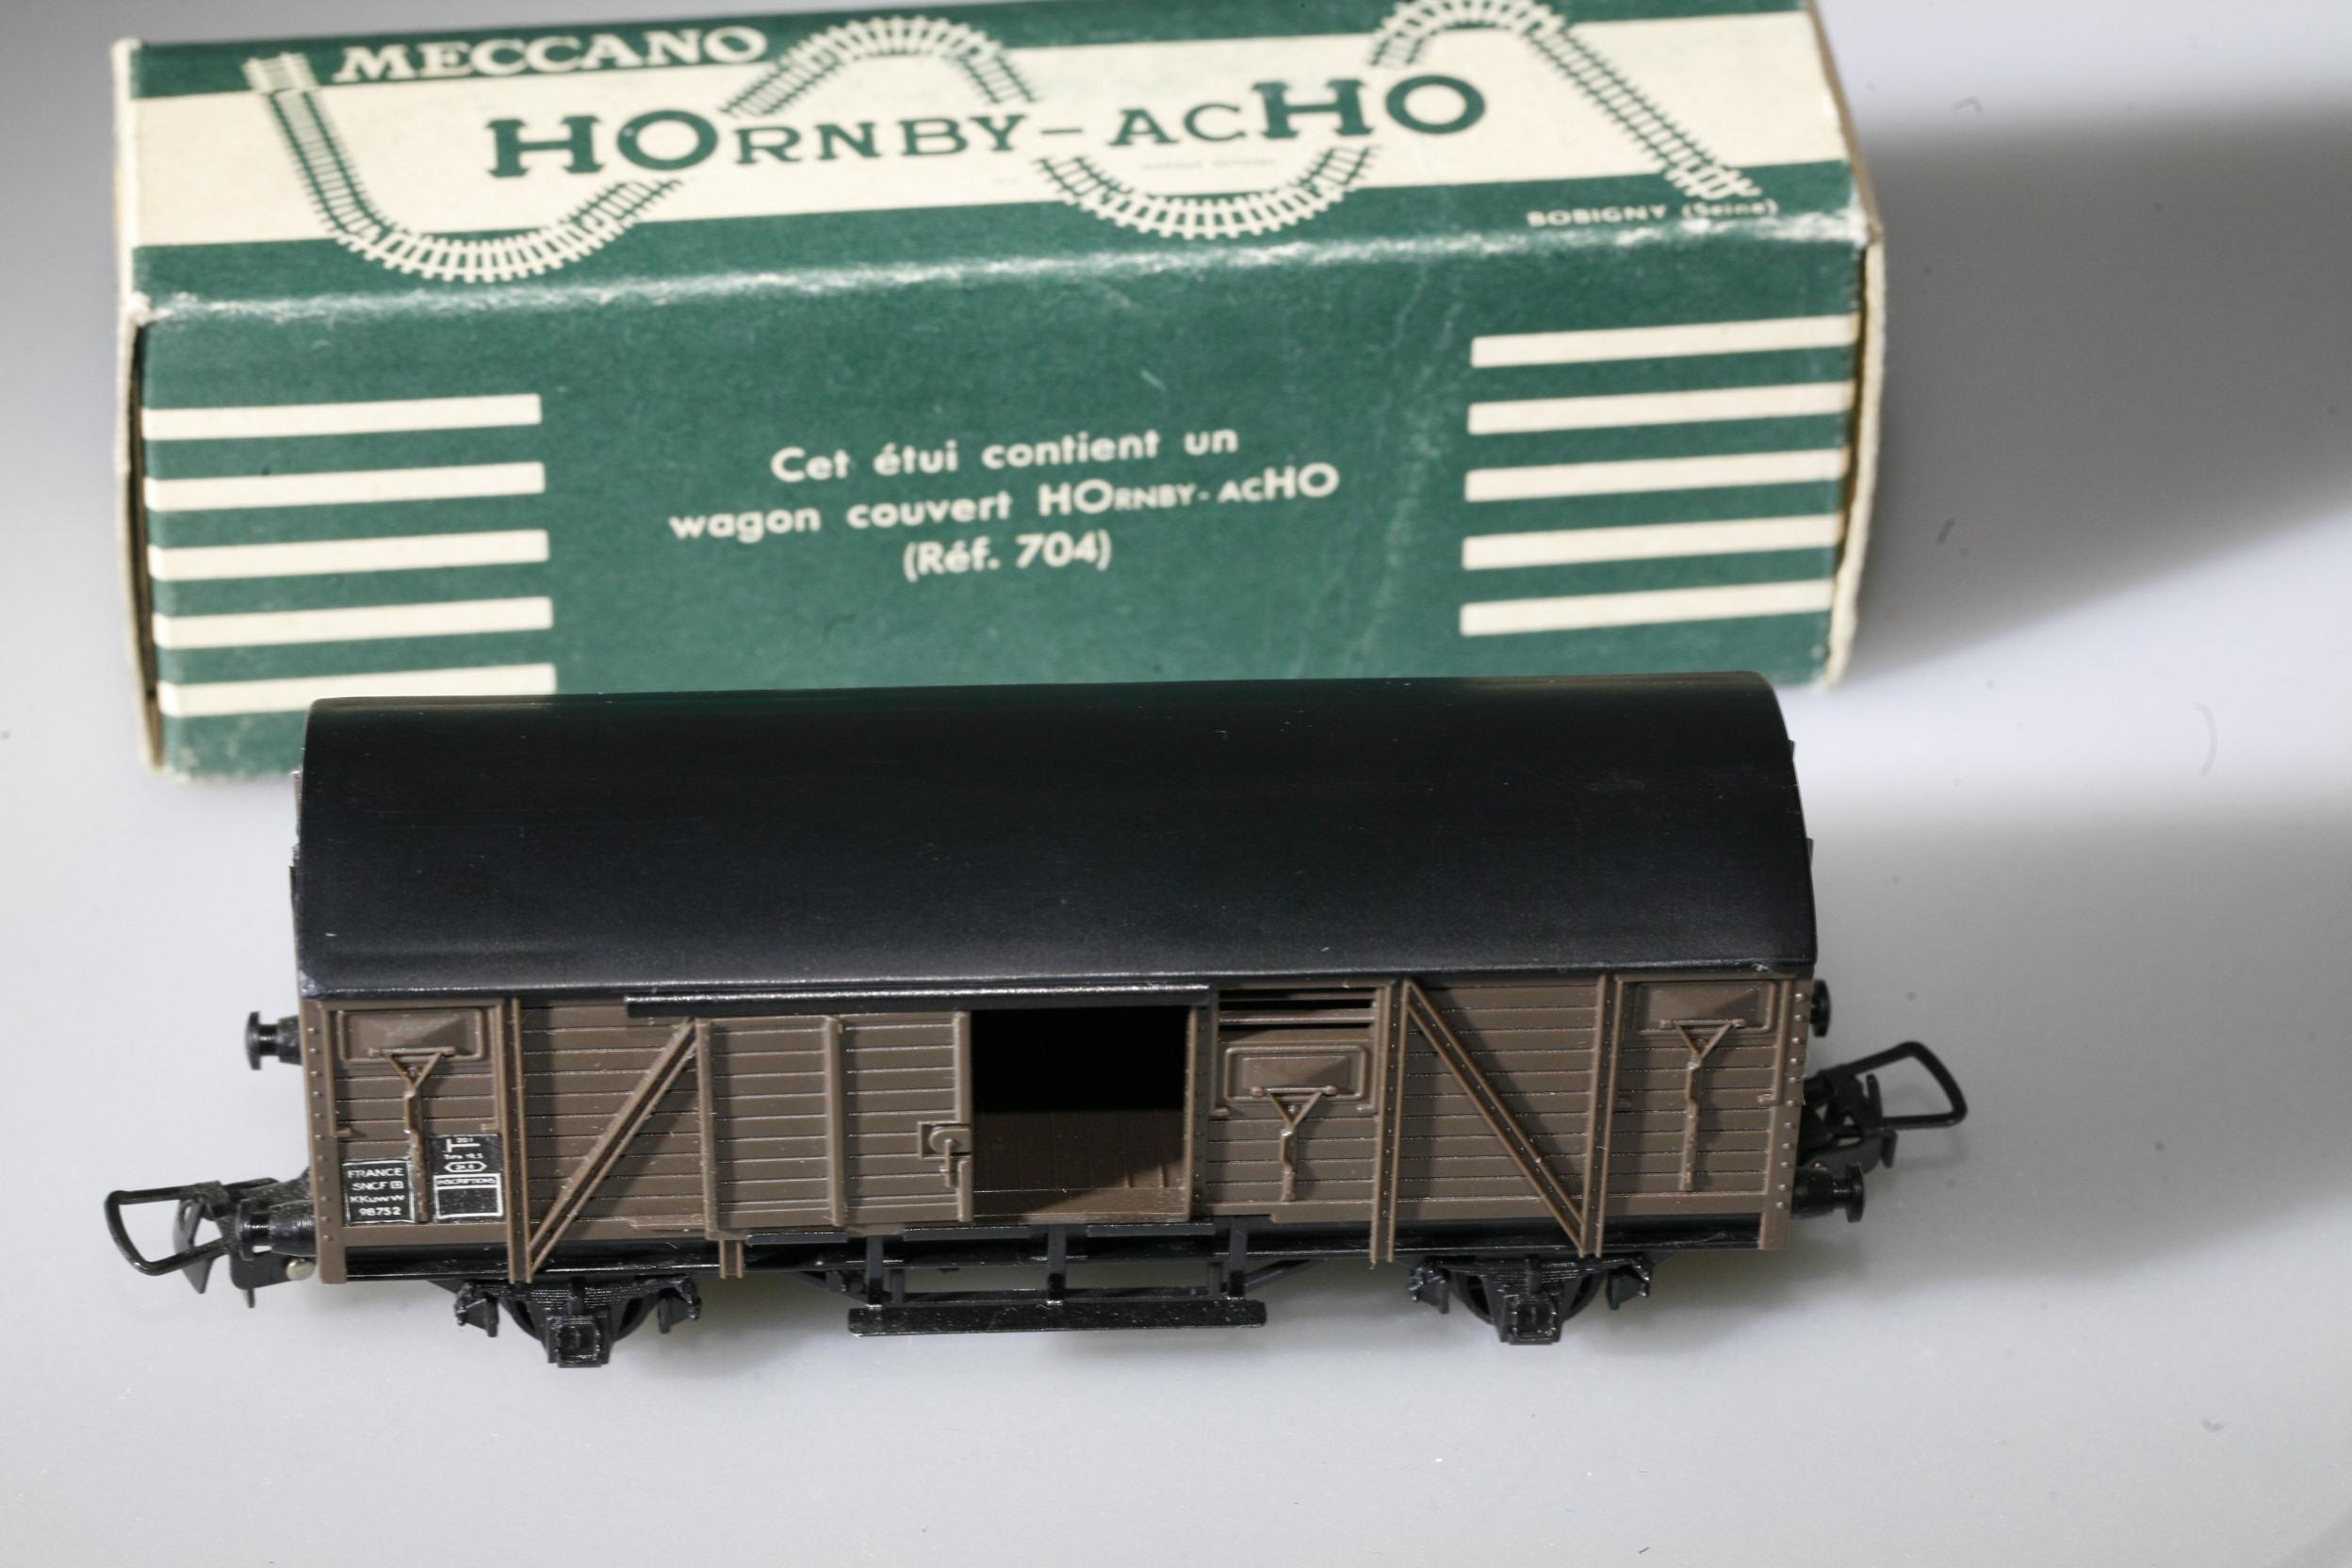 Hornby-Acho 704.1